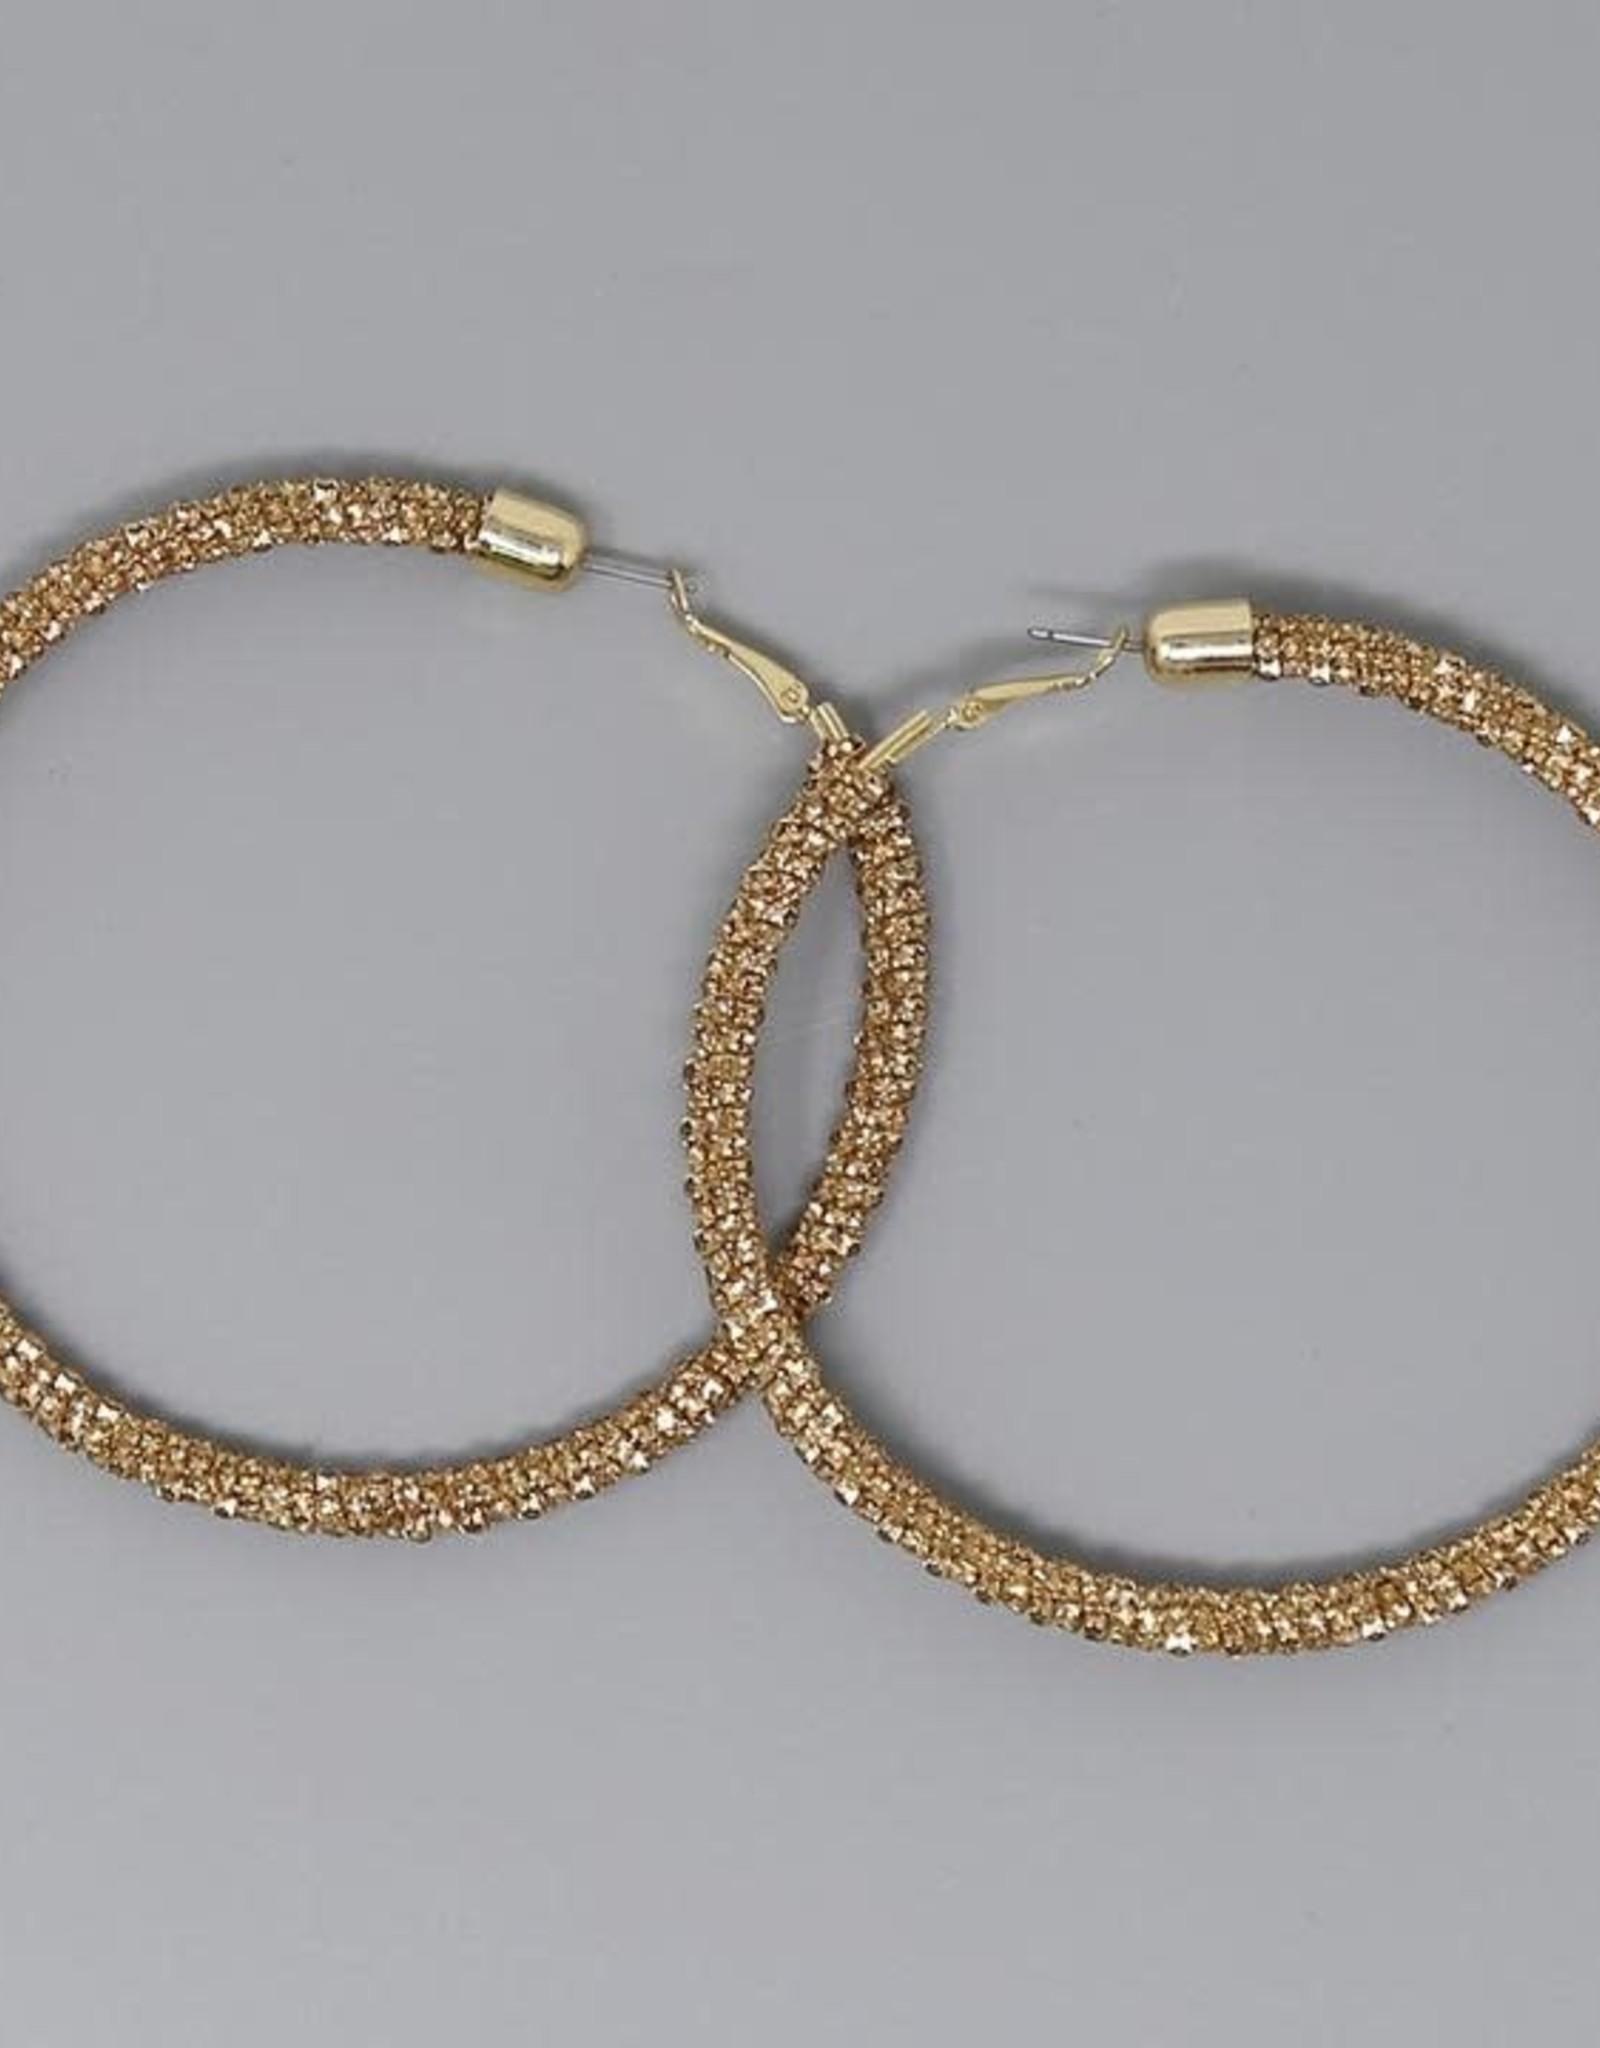 Rhinestone Chain Wrapped Hoop Earrings (80mm) - Gold LCT